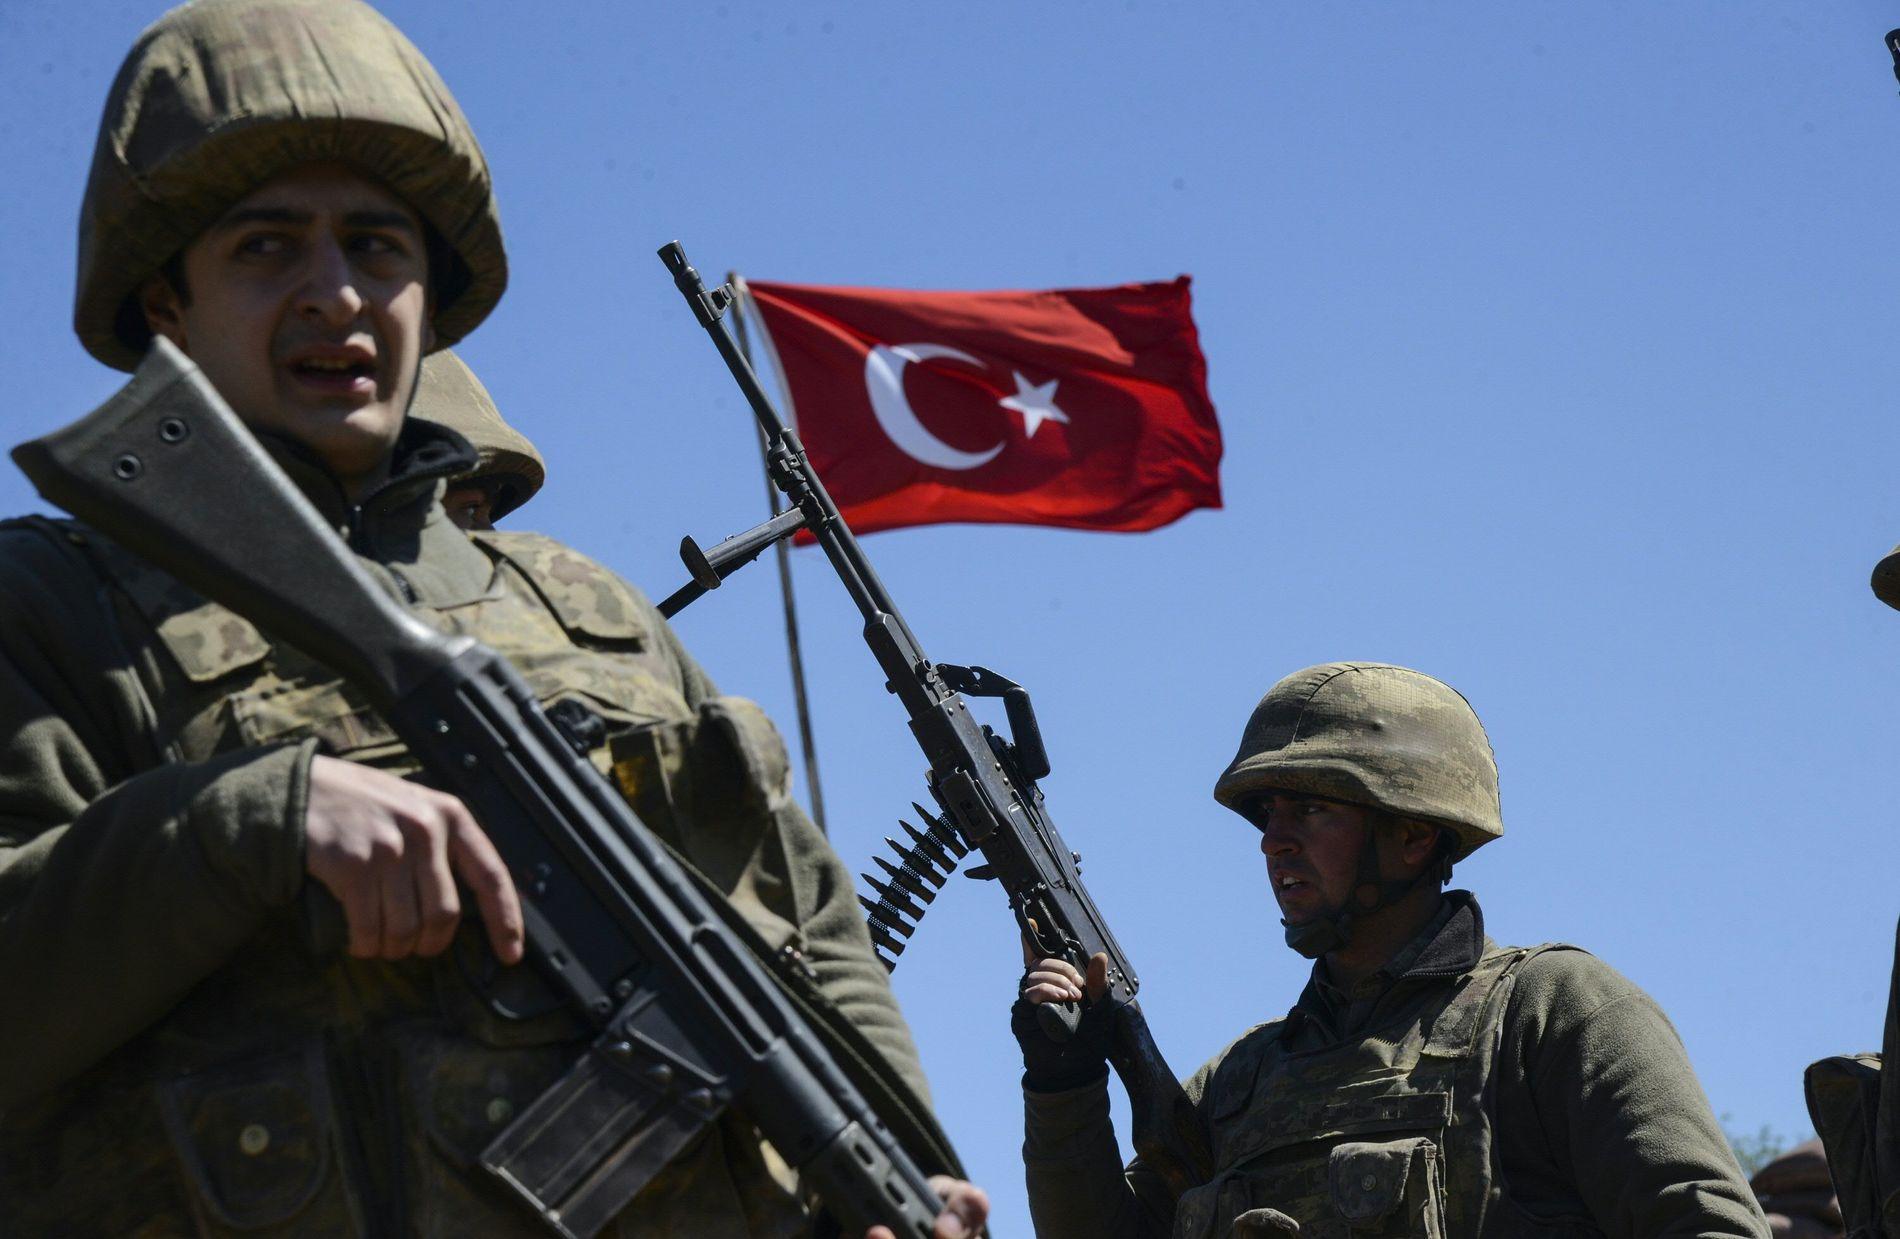 REGIONAL STORMAKT: Tyrkiske soldater, her i den tyrkiske byen Cizre i de kurdiske områdene i Tyrkia, der det har vært en rekke kamper det siste året.